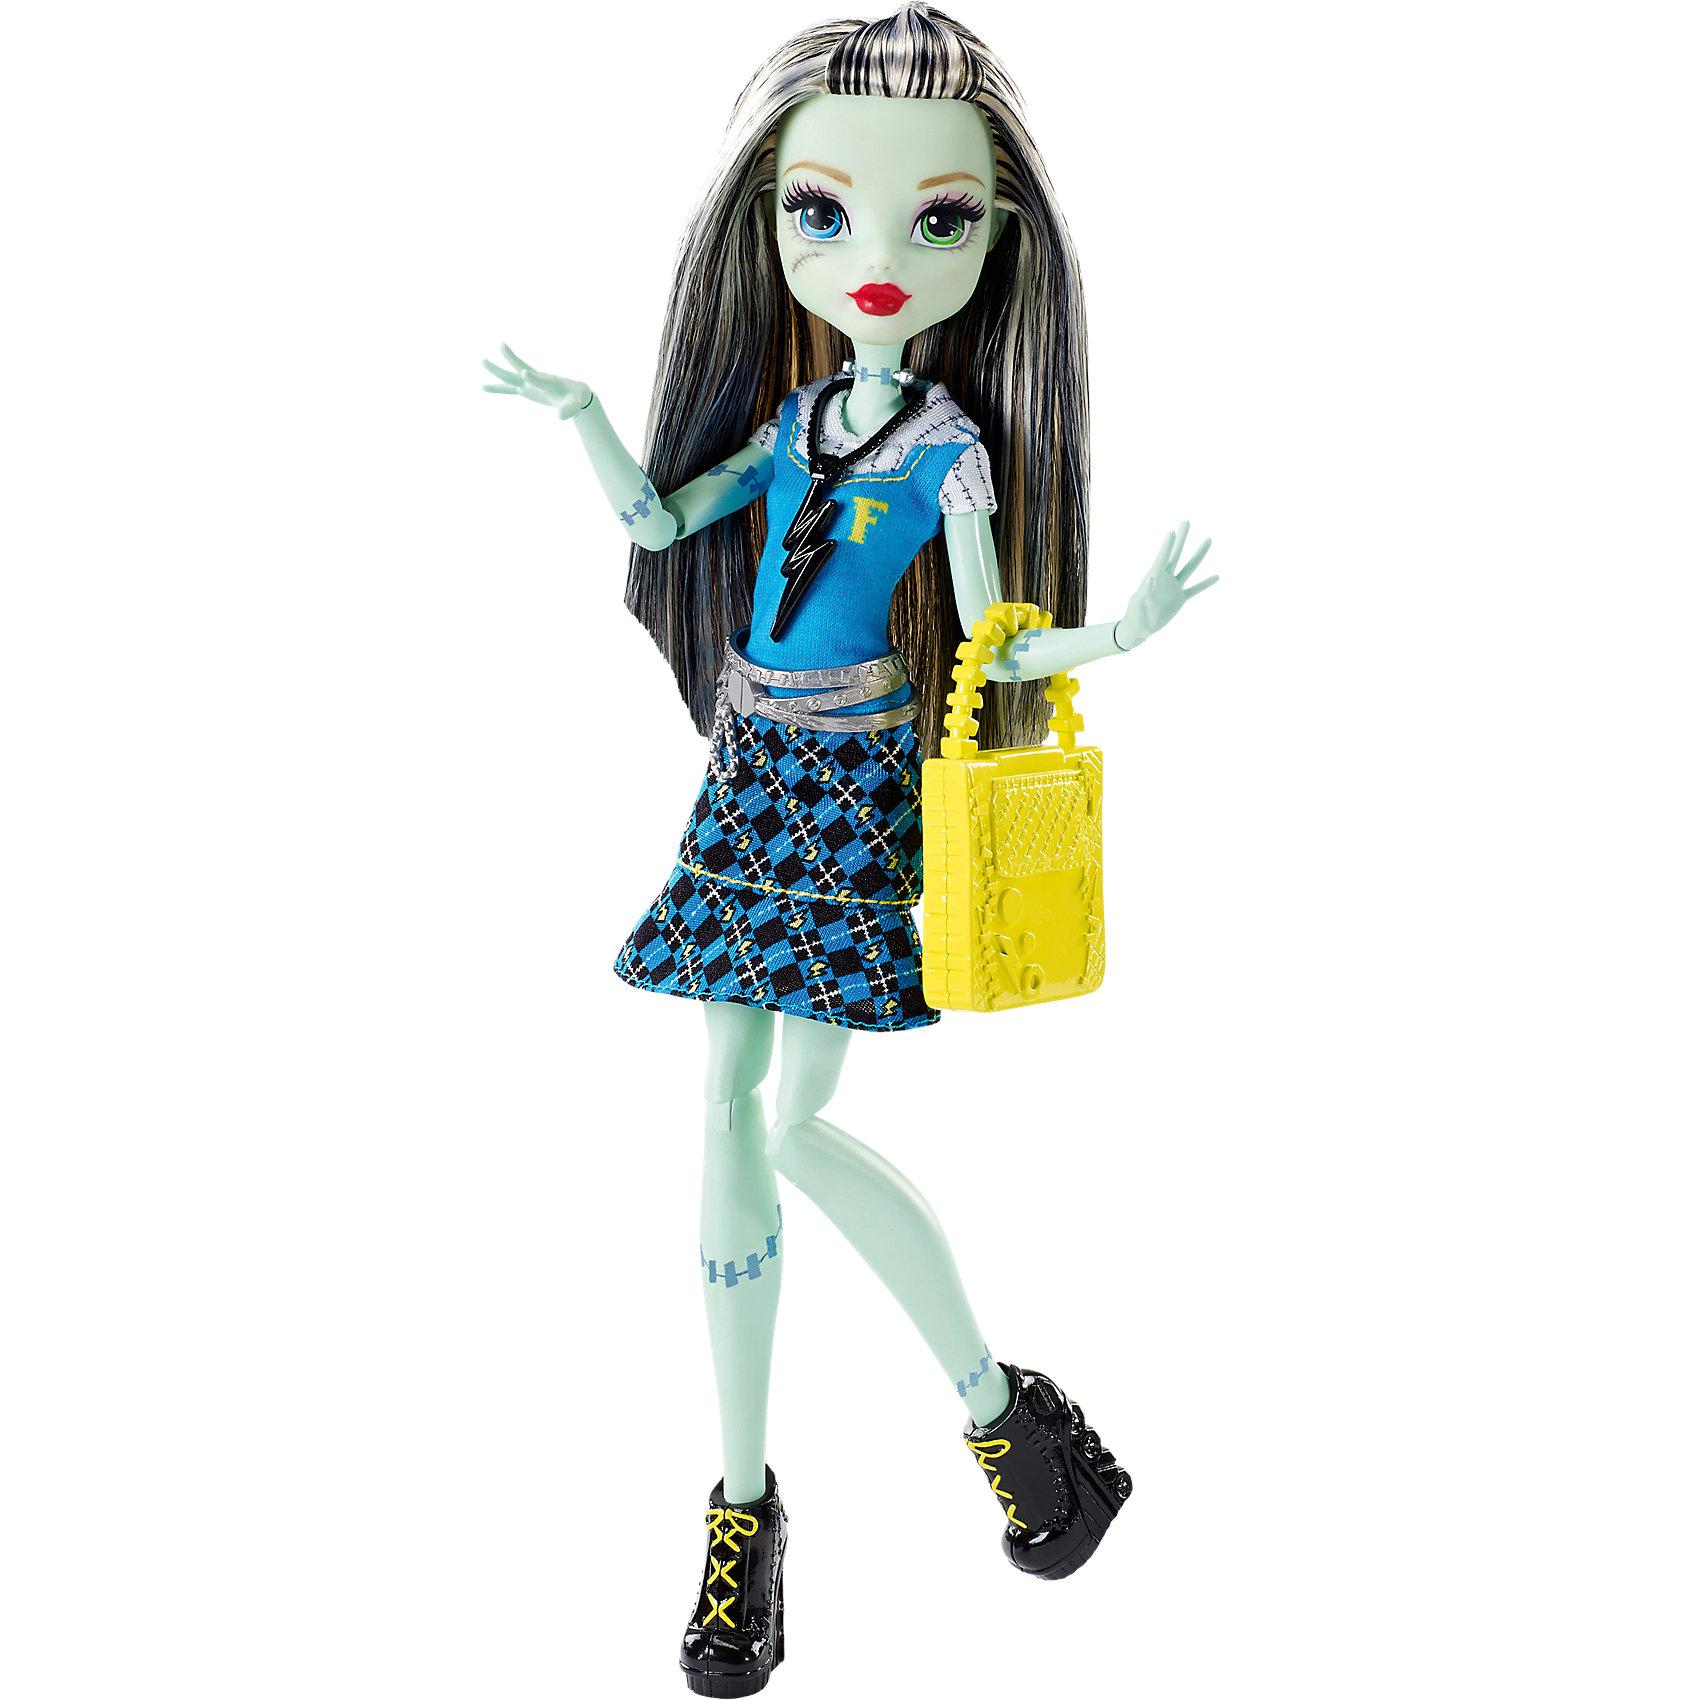 Mattel Кукла Фрэнки Штейн в модном наряде, Monster High monster high фрэнки штейн главные герои